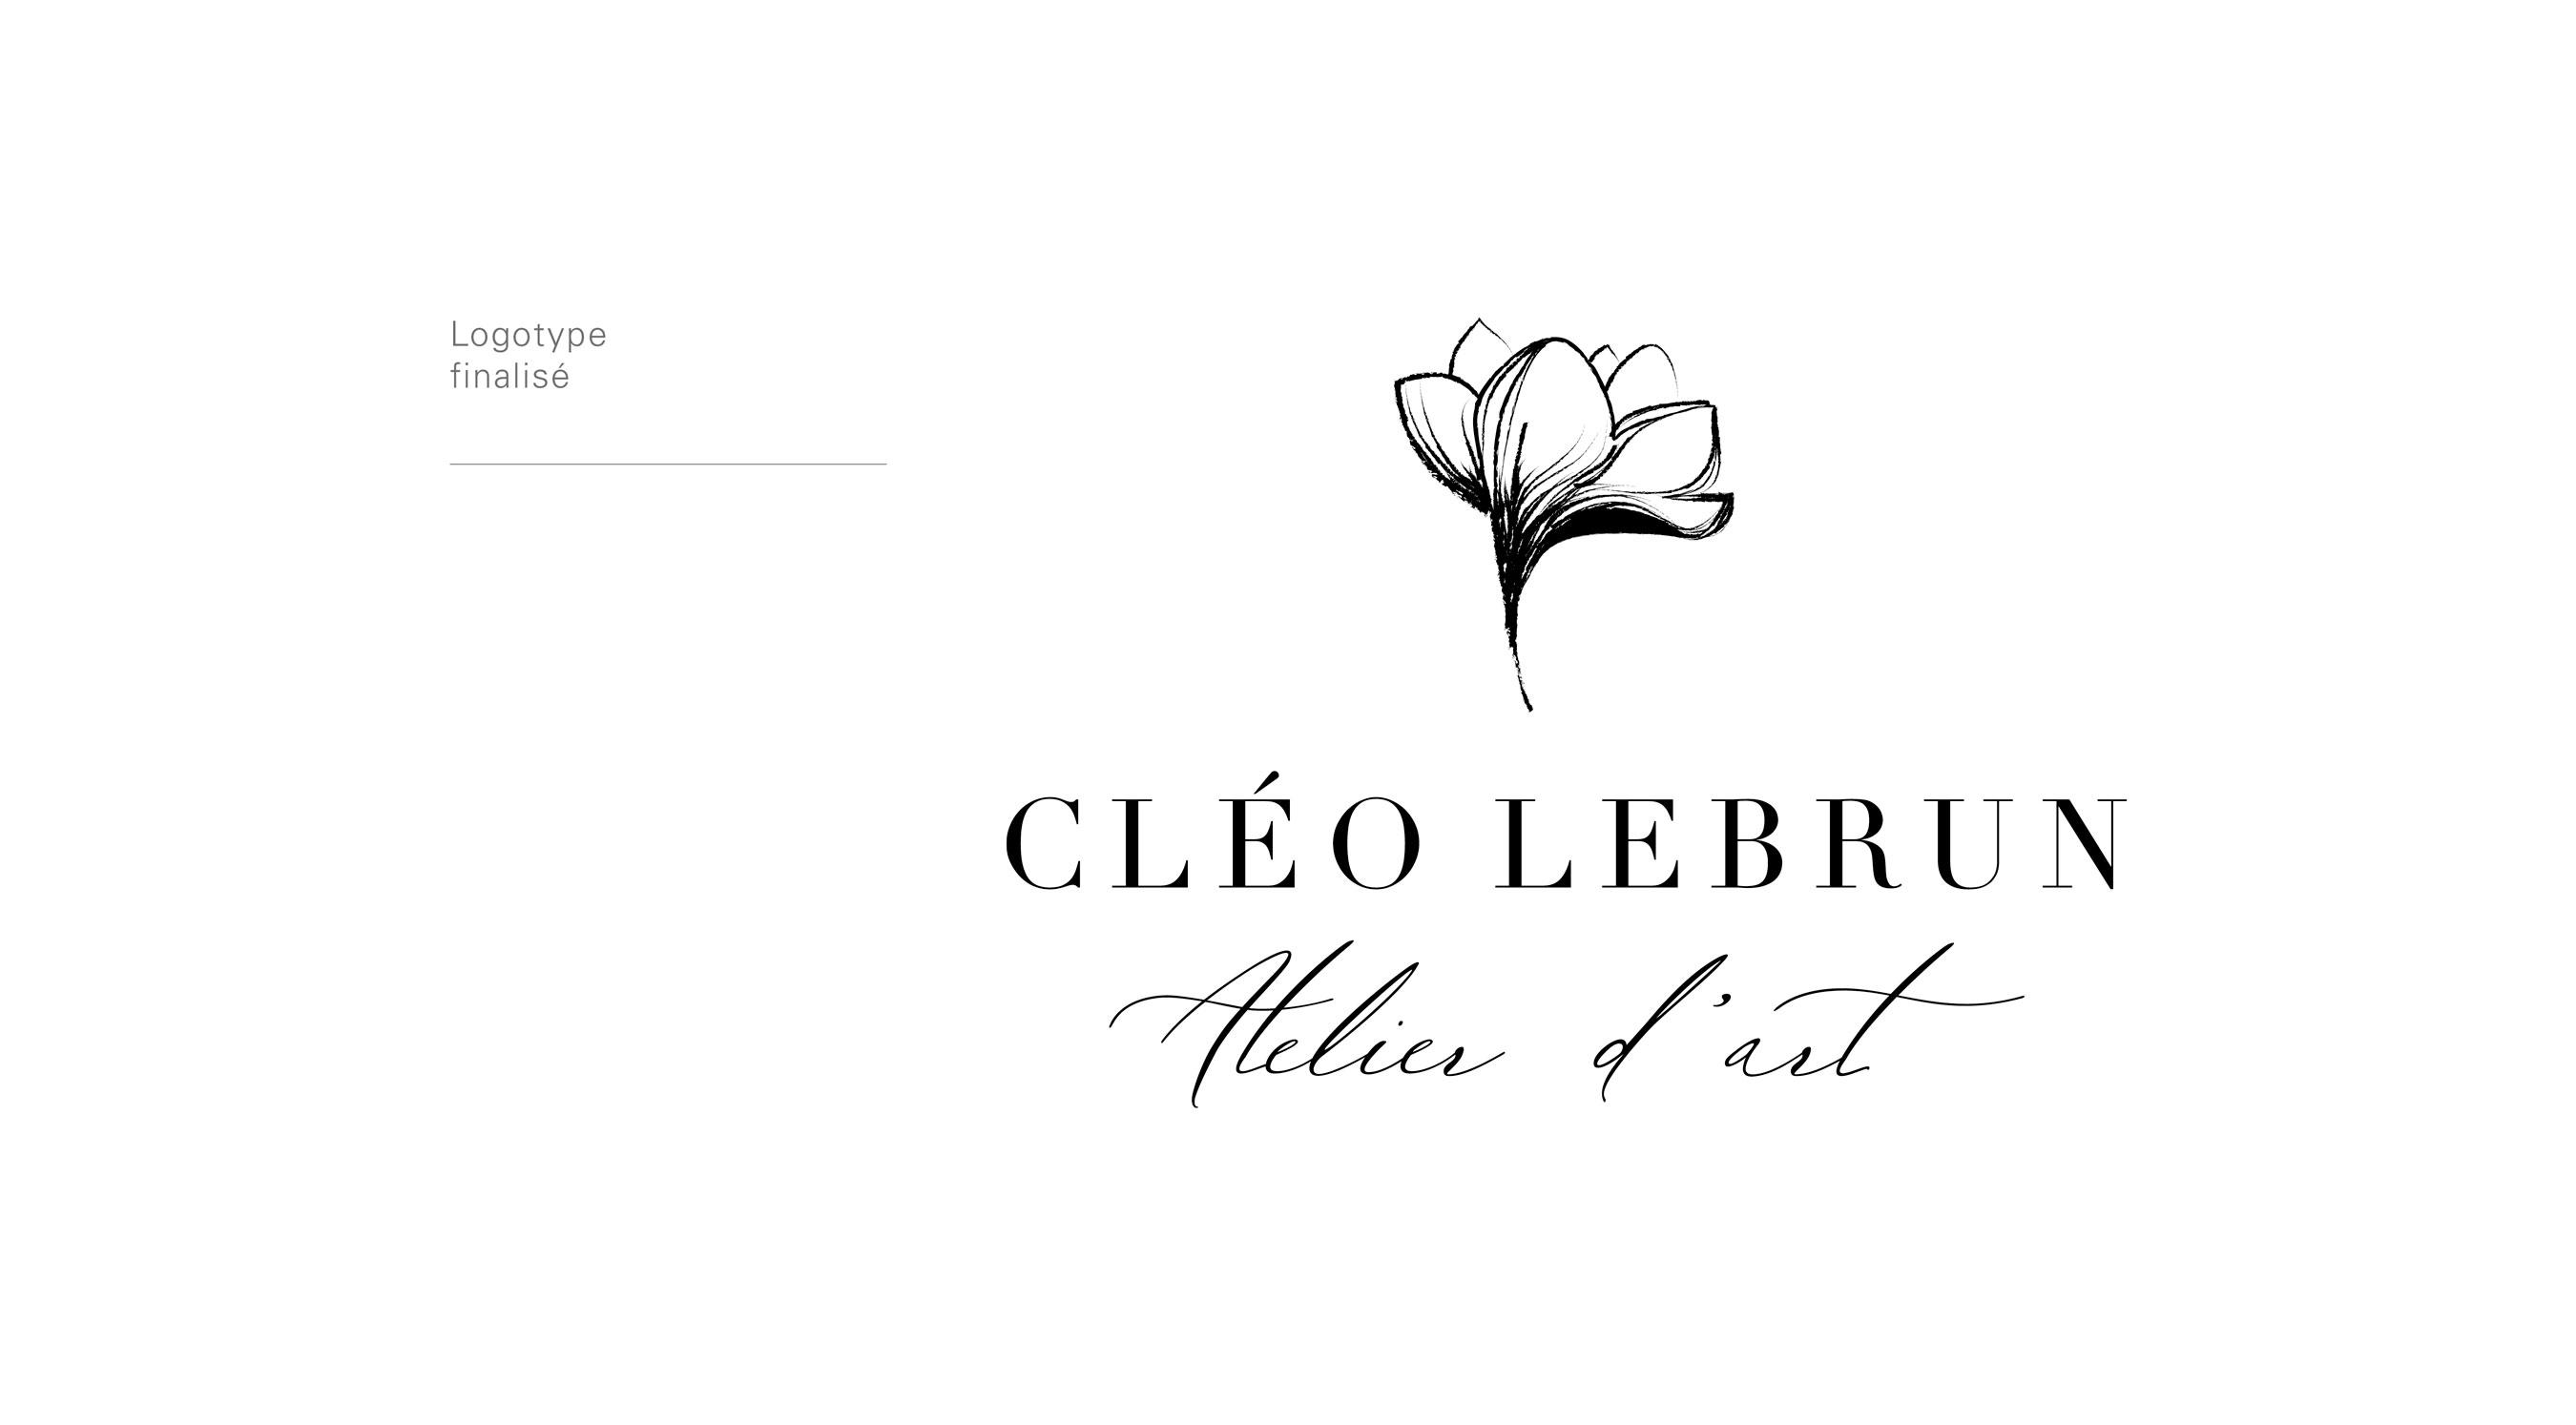 Atelier d'art Cléo Lebrun 5